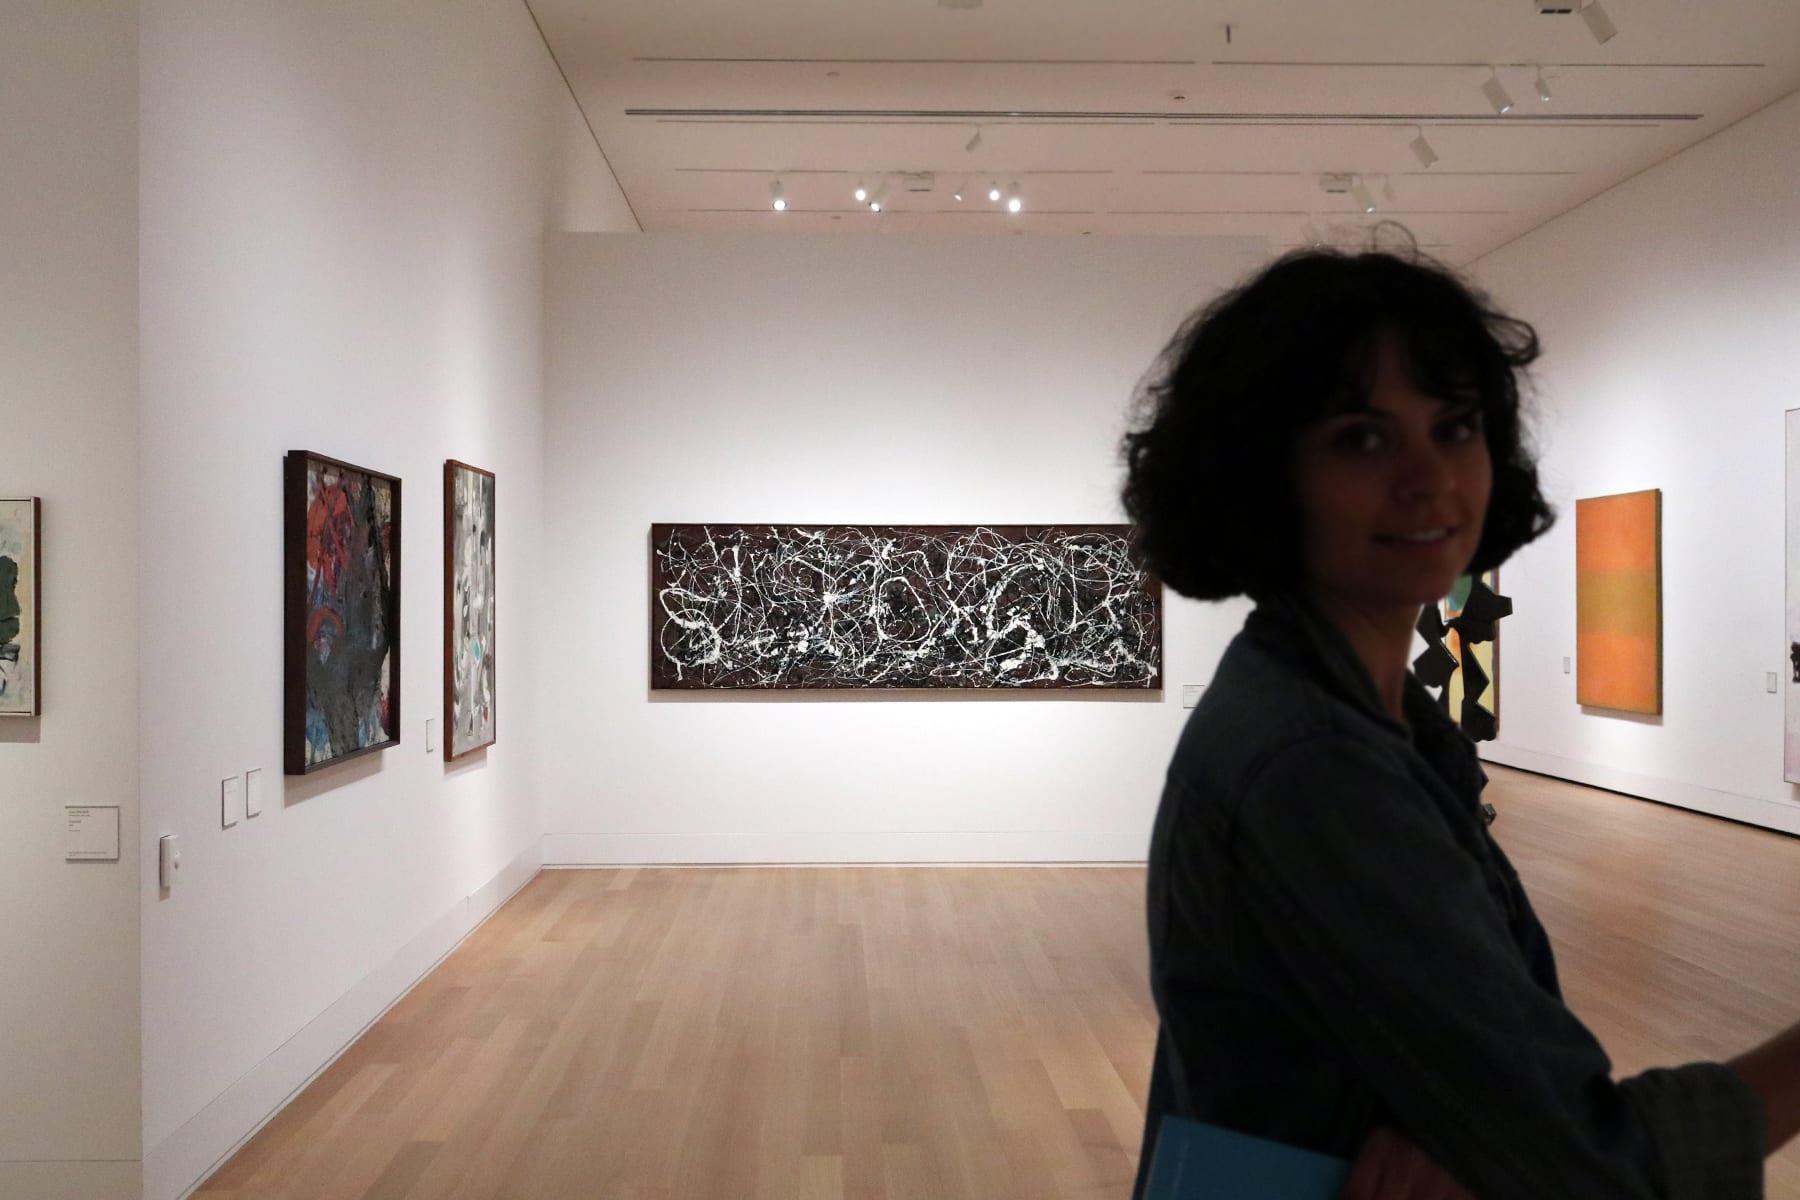 07-CT-journey-yale19-artmuseum10.jpg